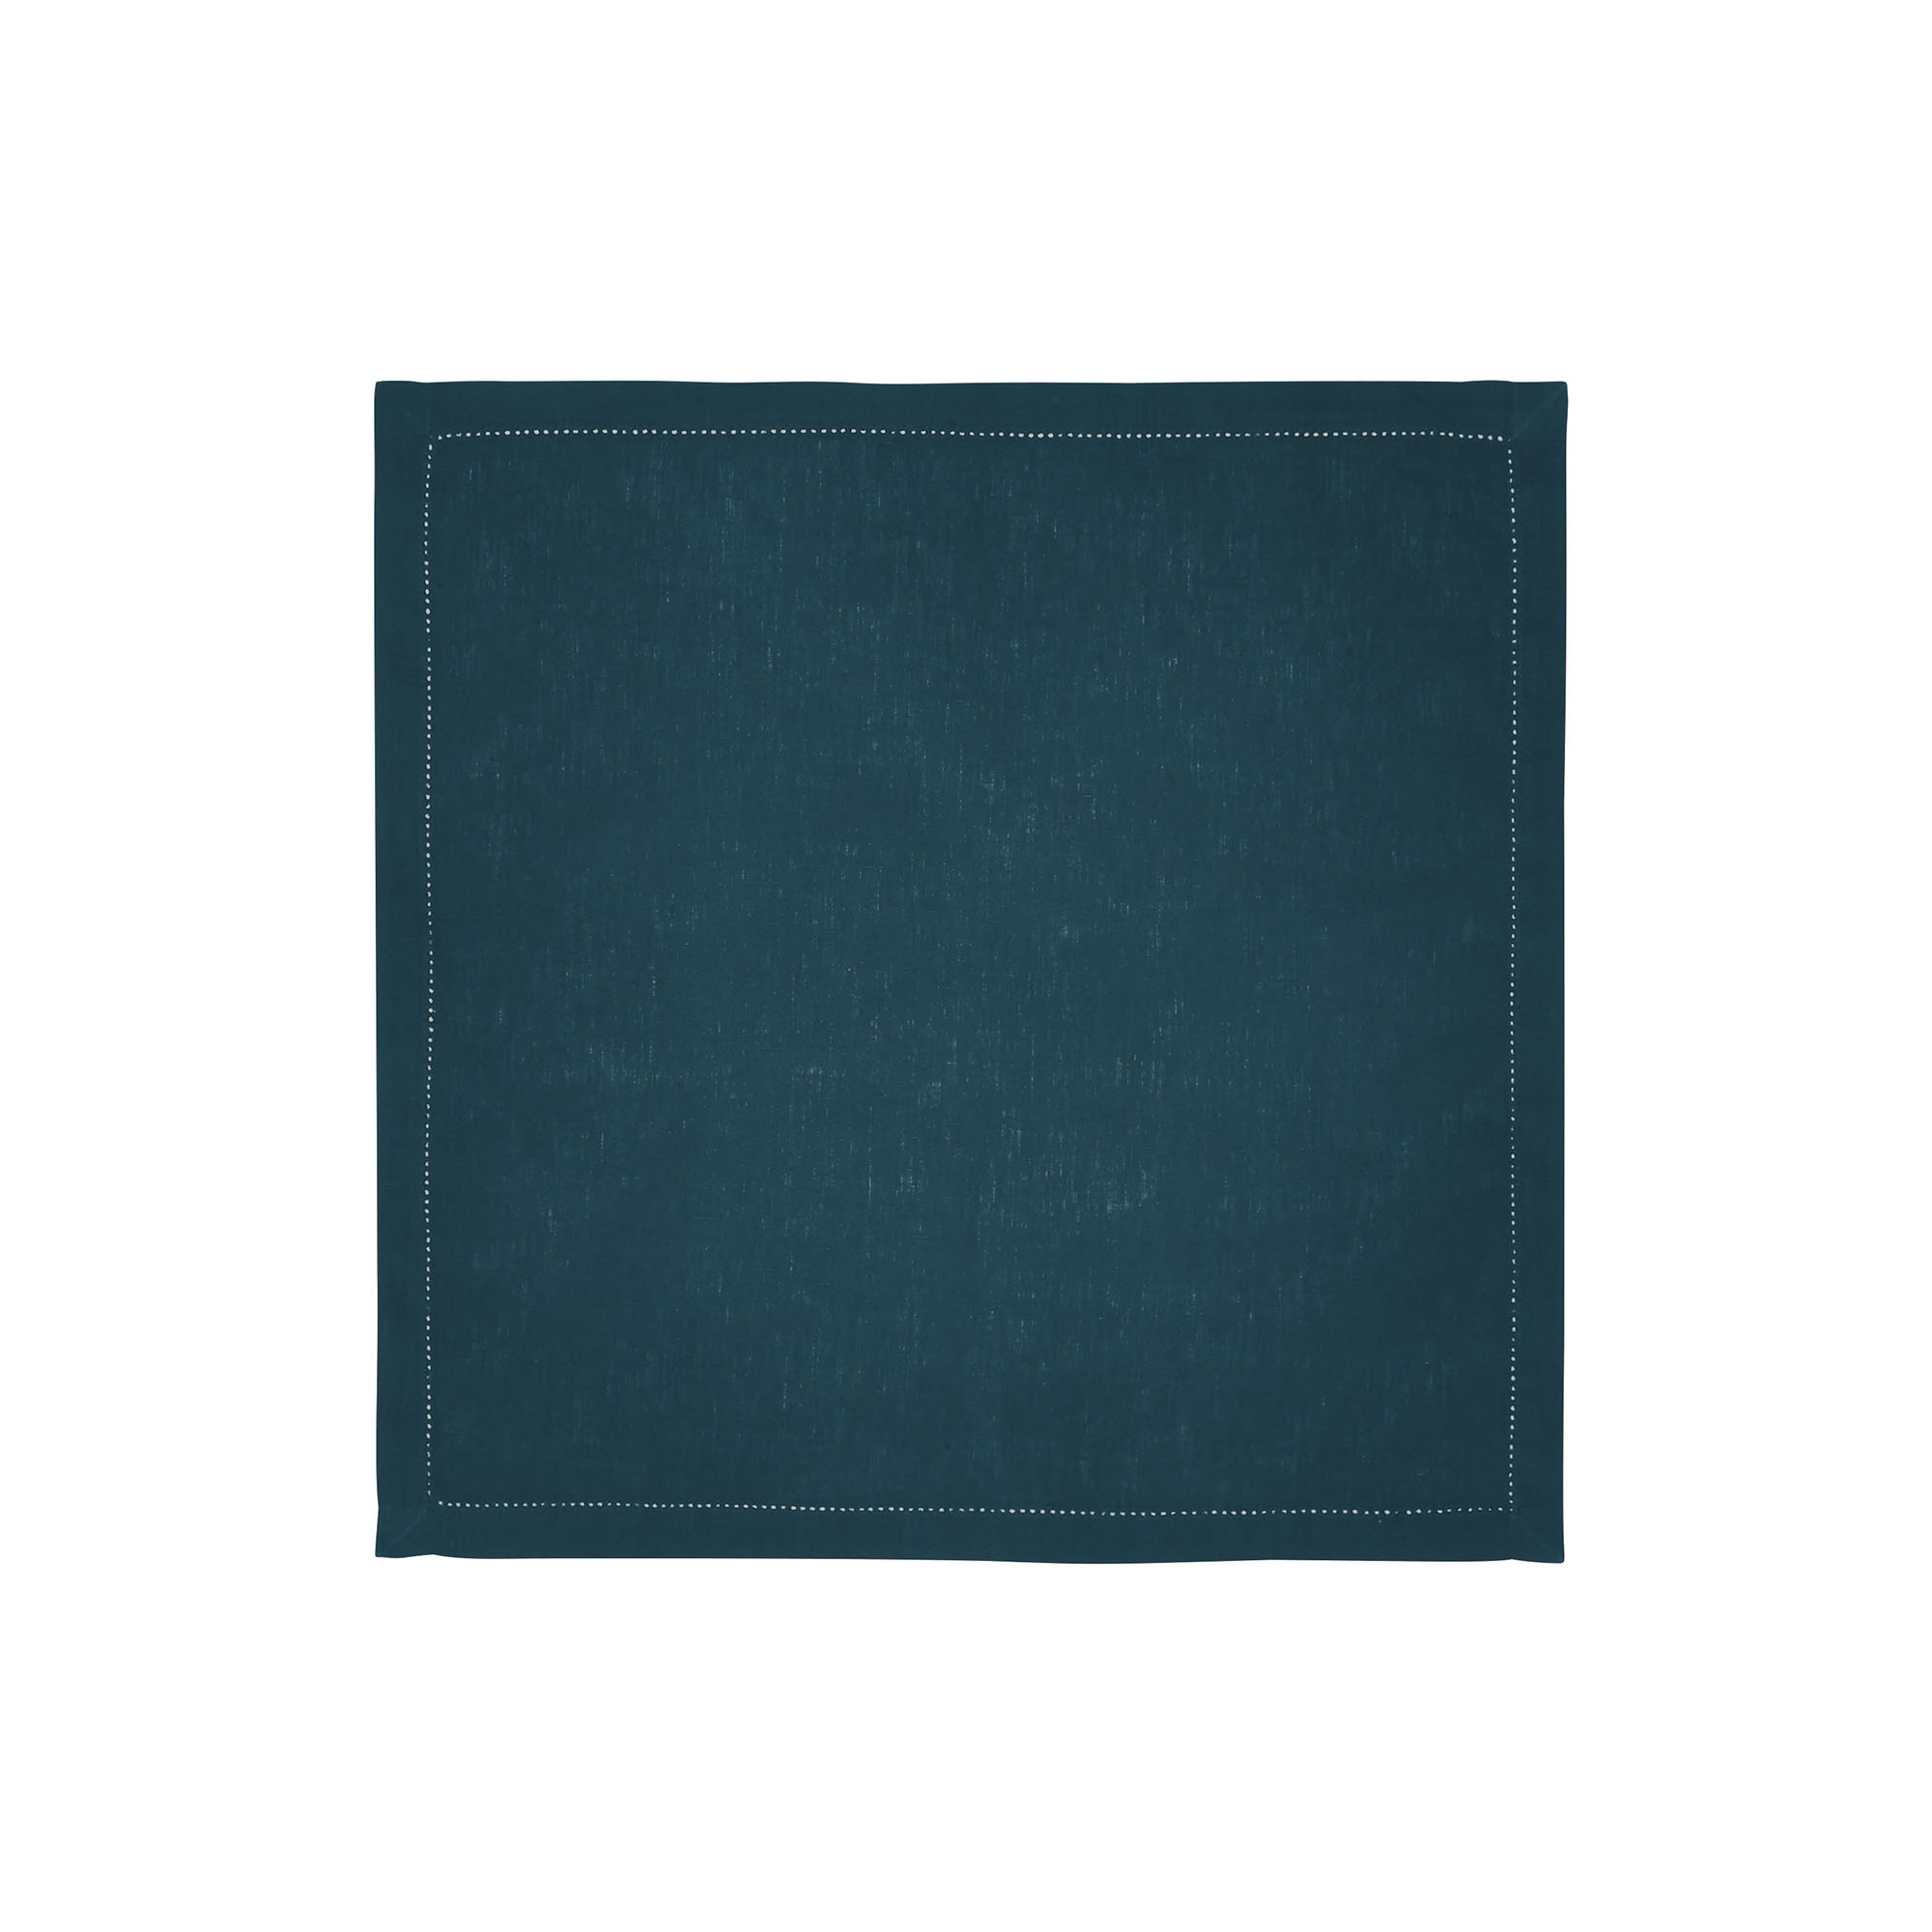 Serviette de table en lin vert 50x50